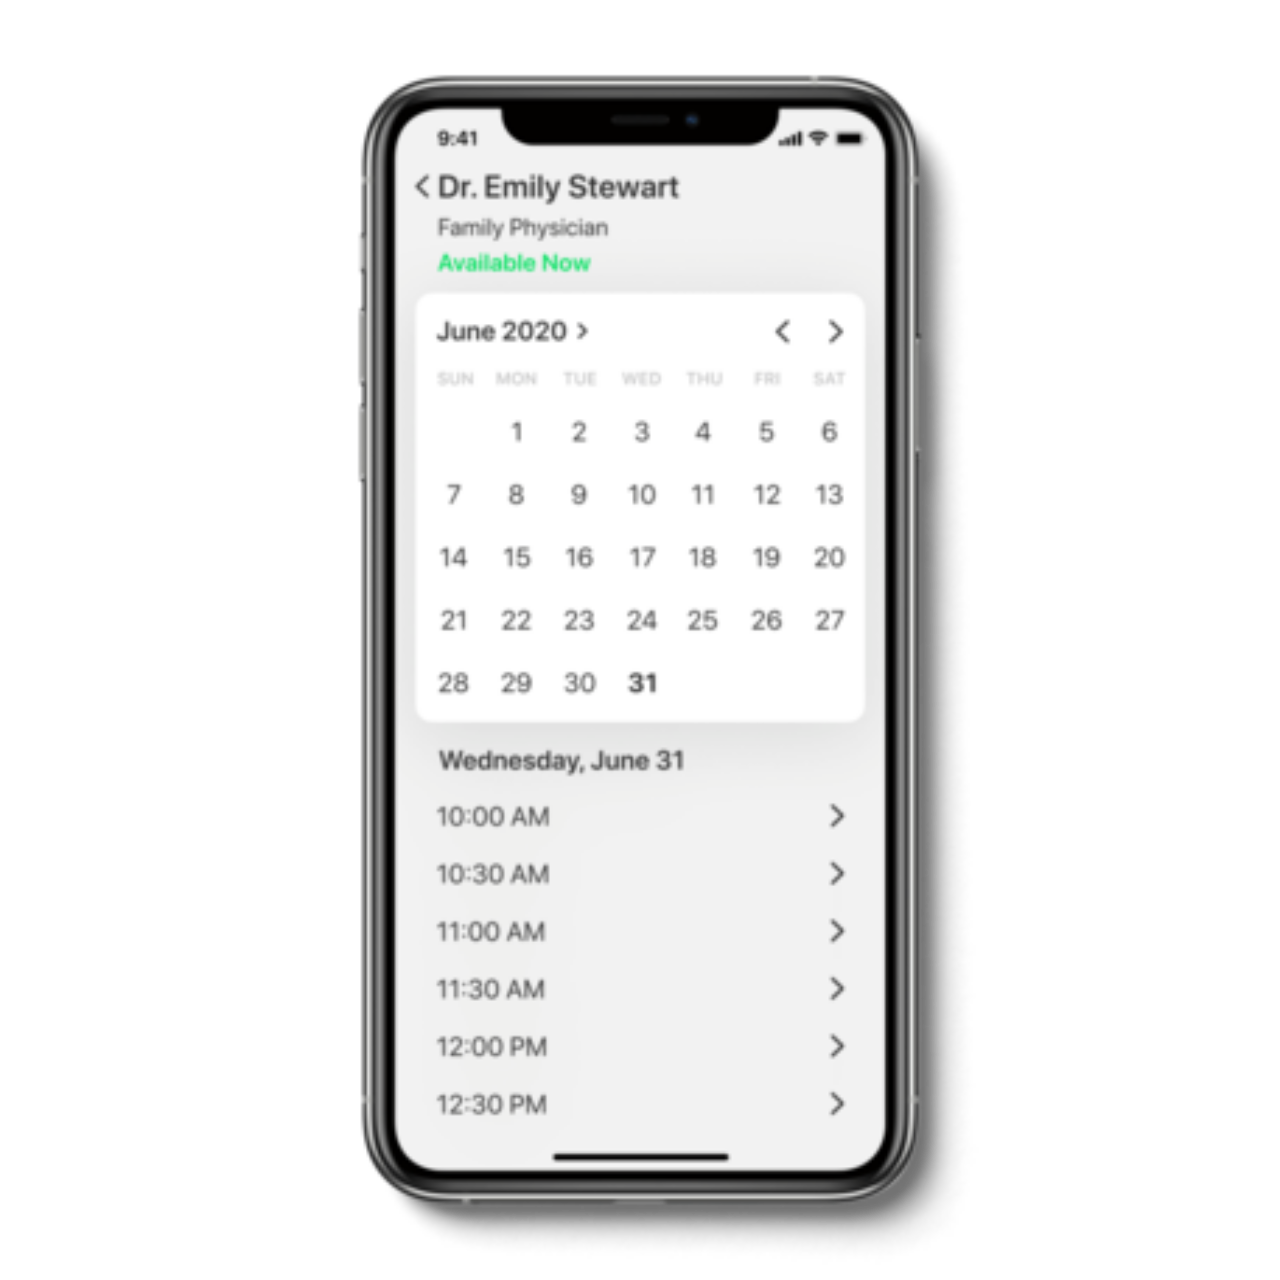 Medical Services App Calendar